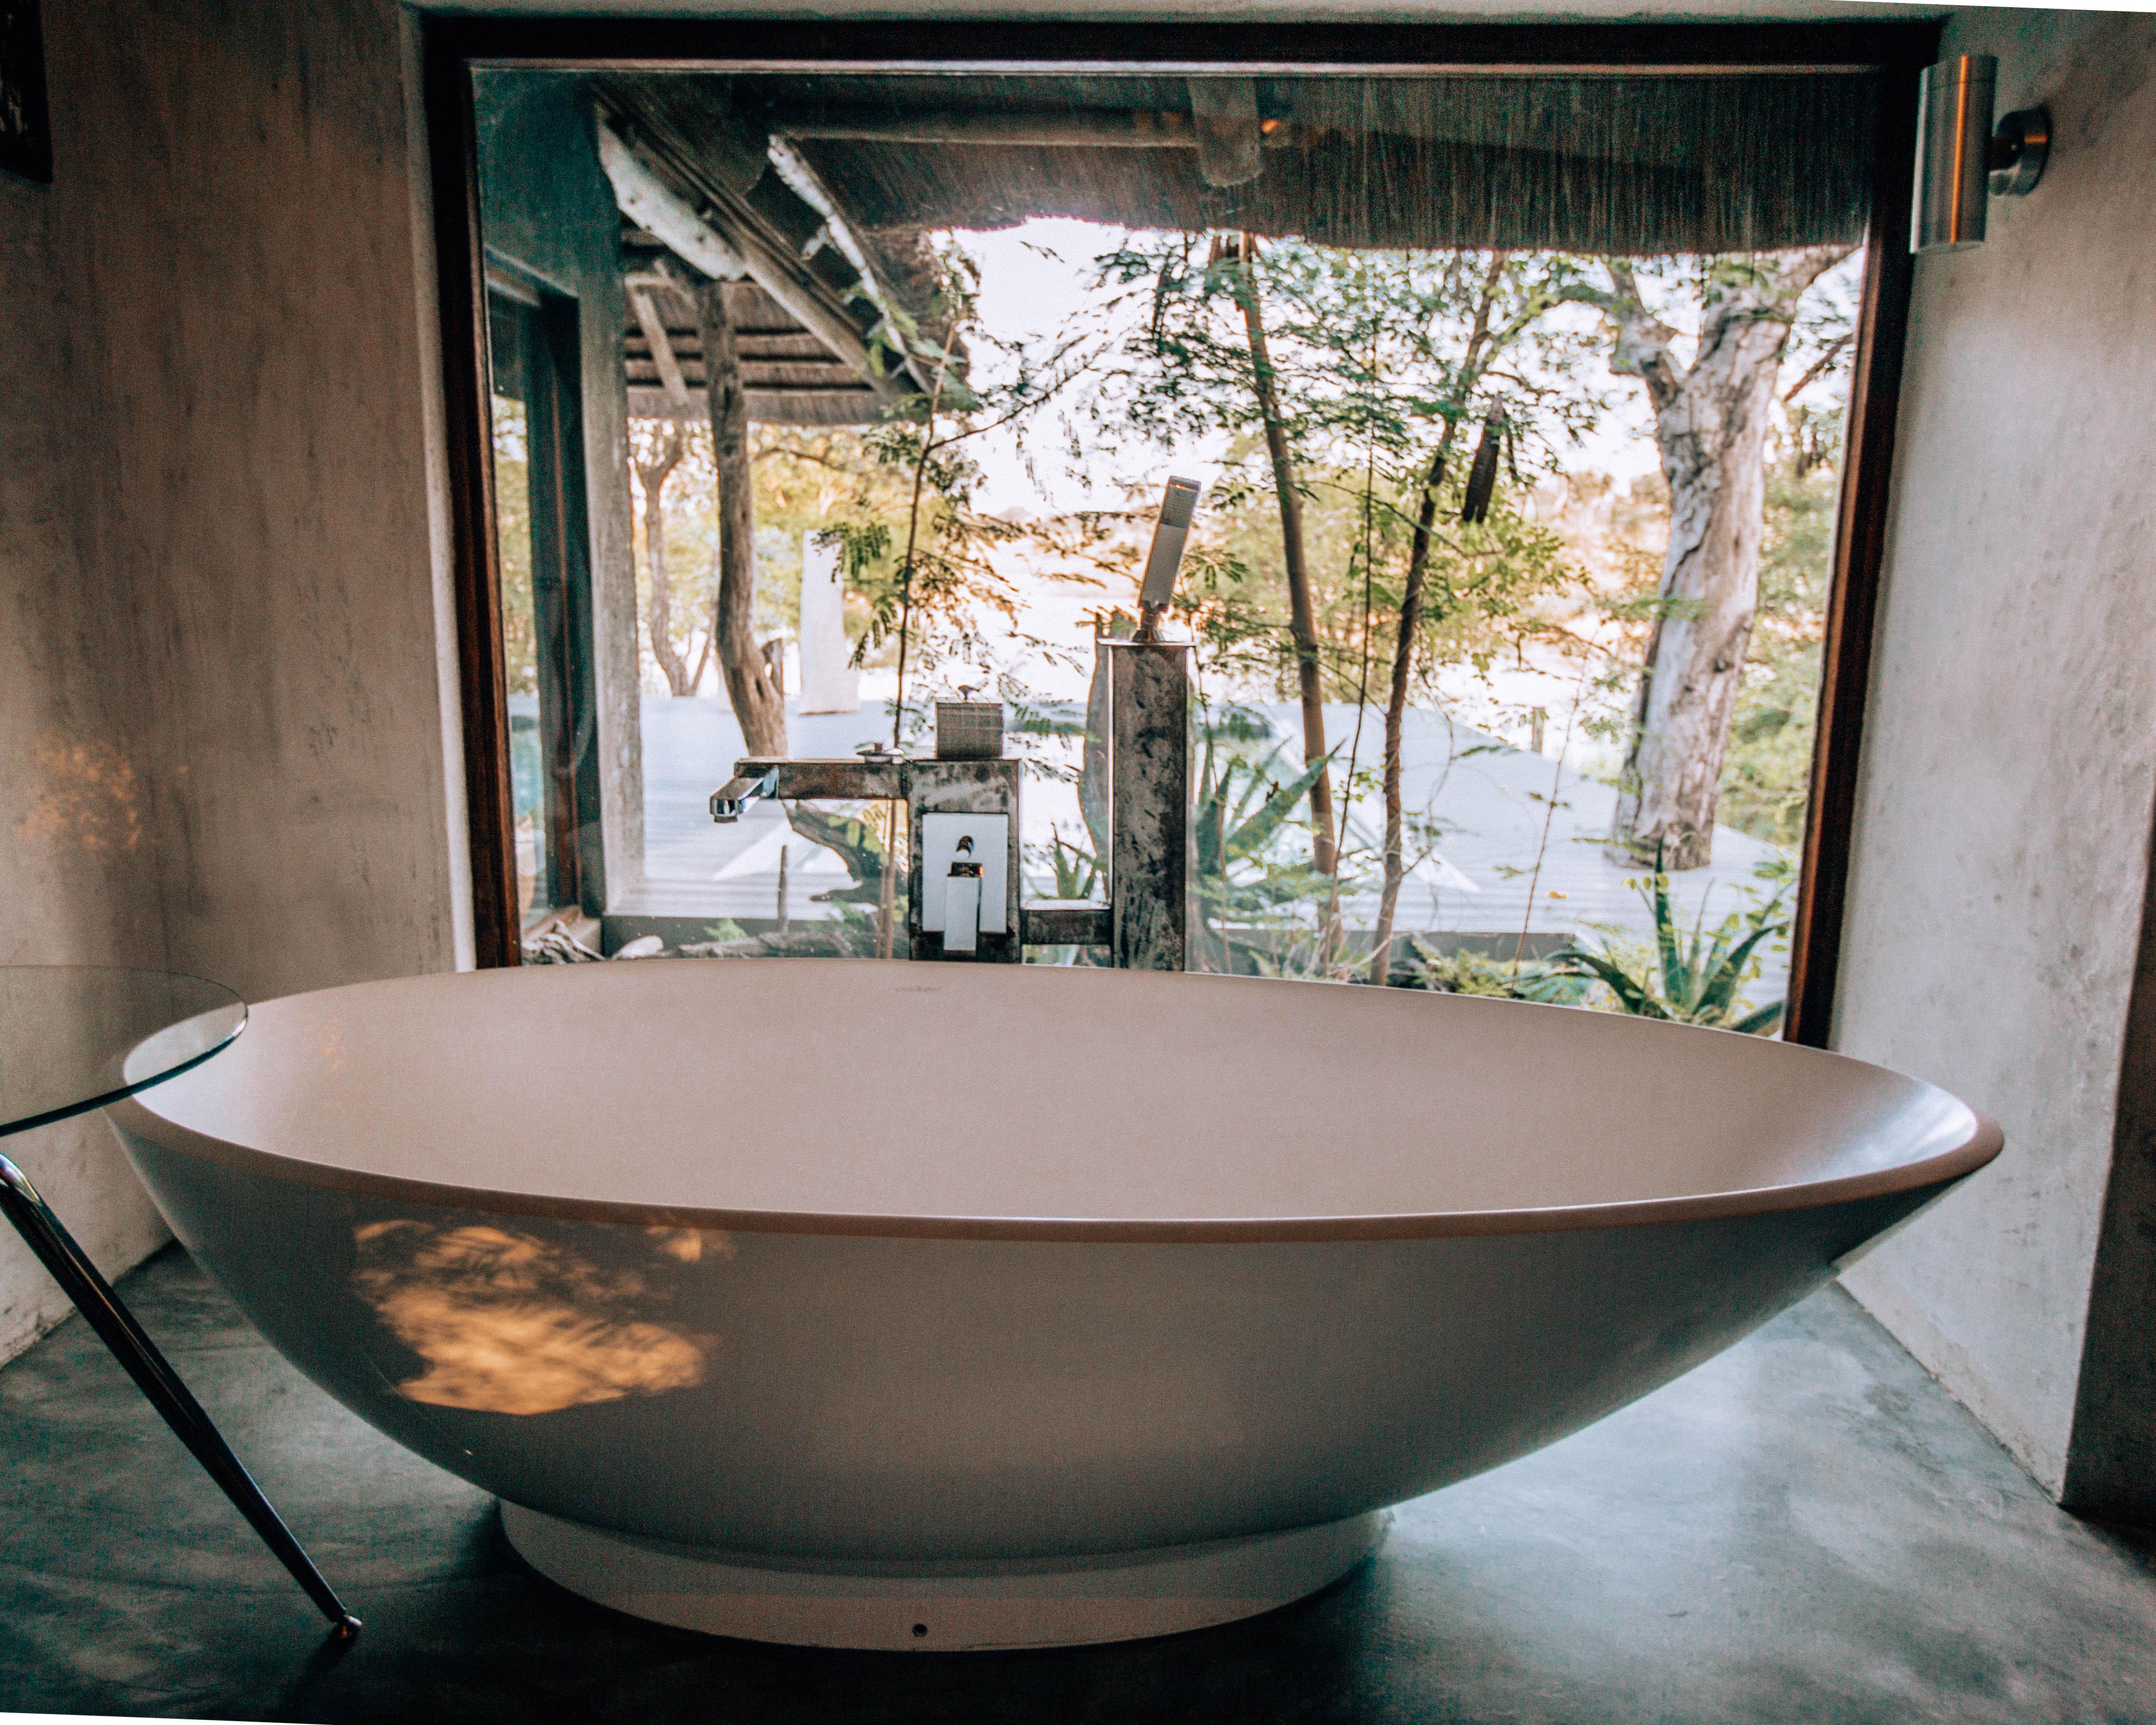 Bathtub goals!